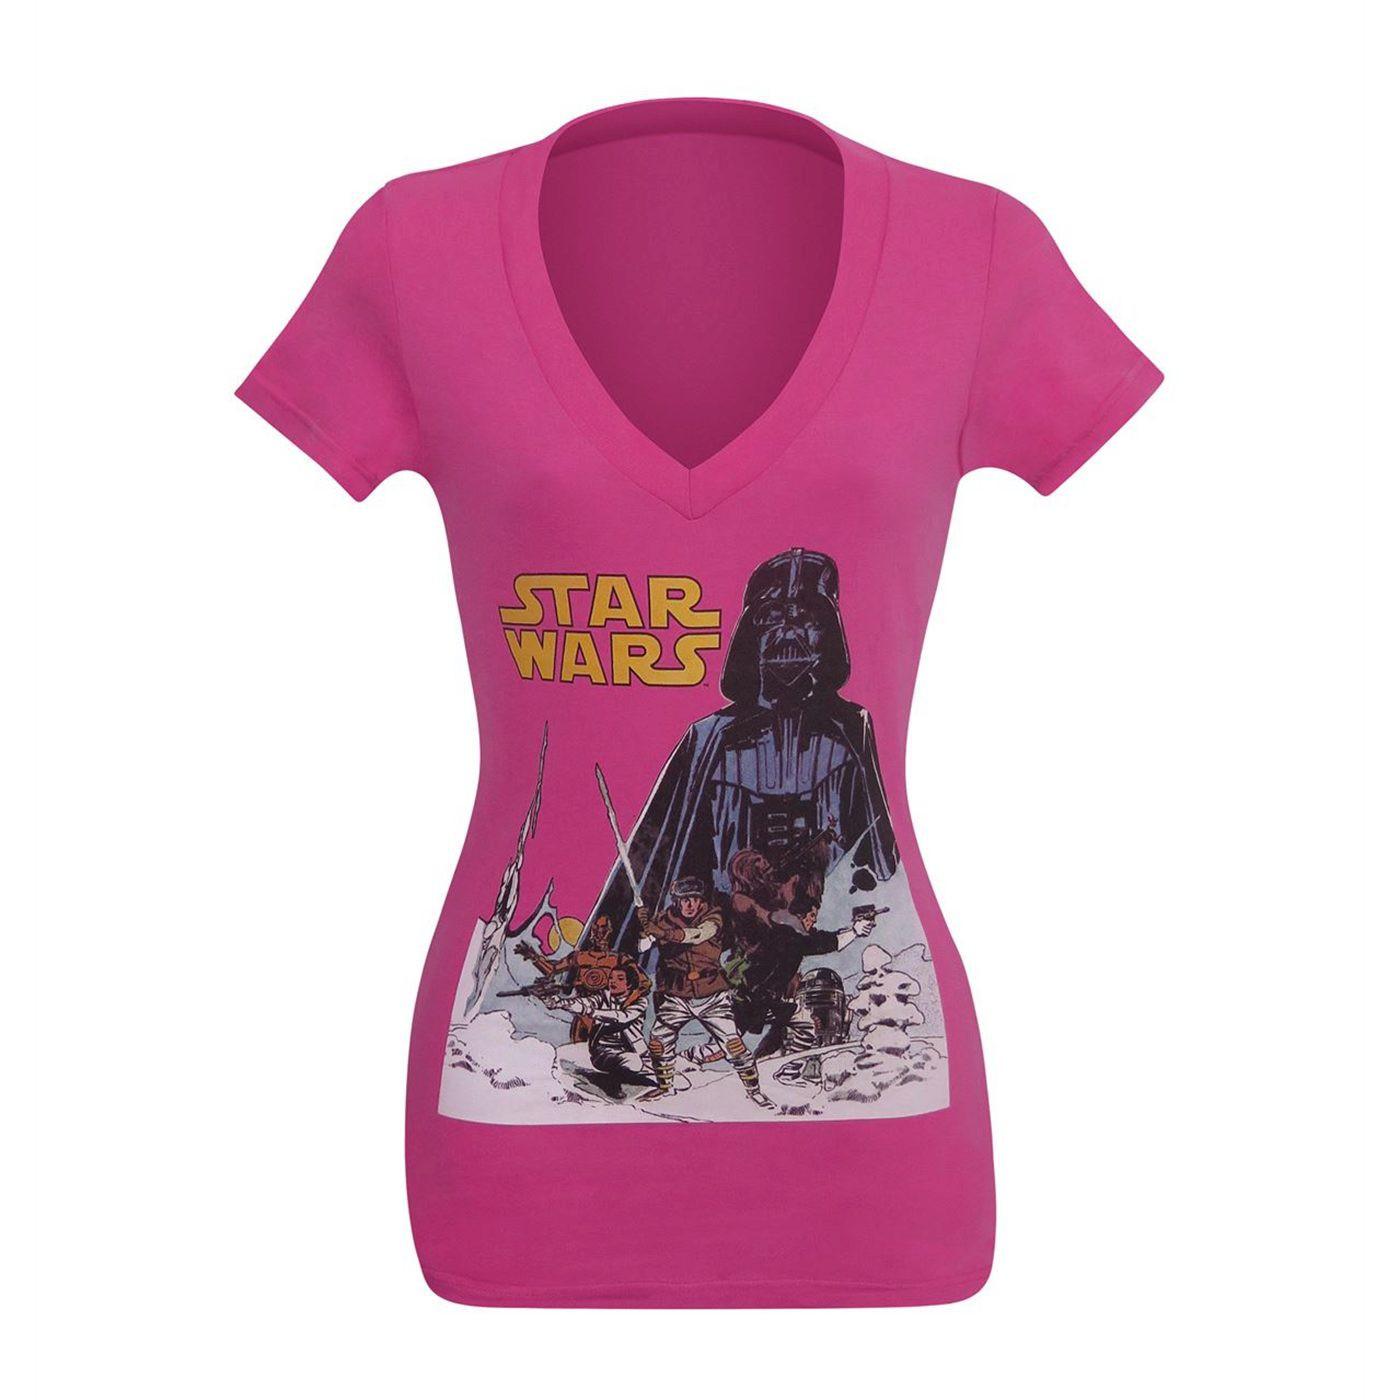 Star Wars Hoth Women's Pink V-Neck T-Shirt